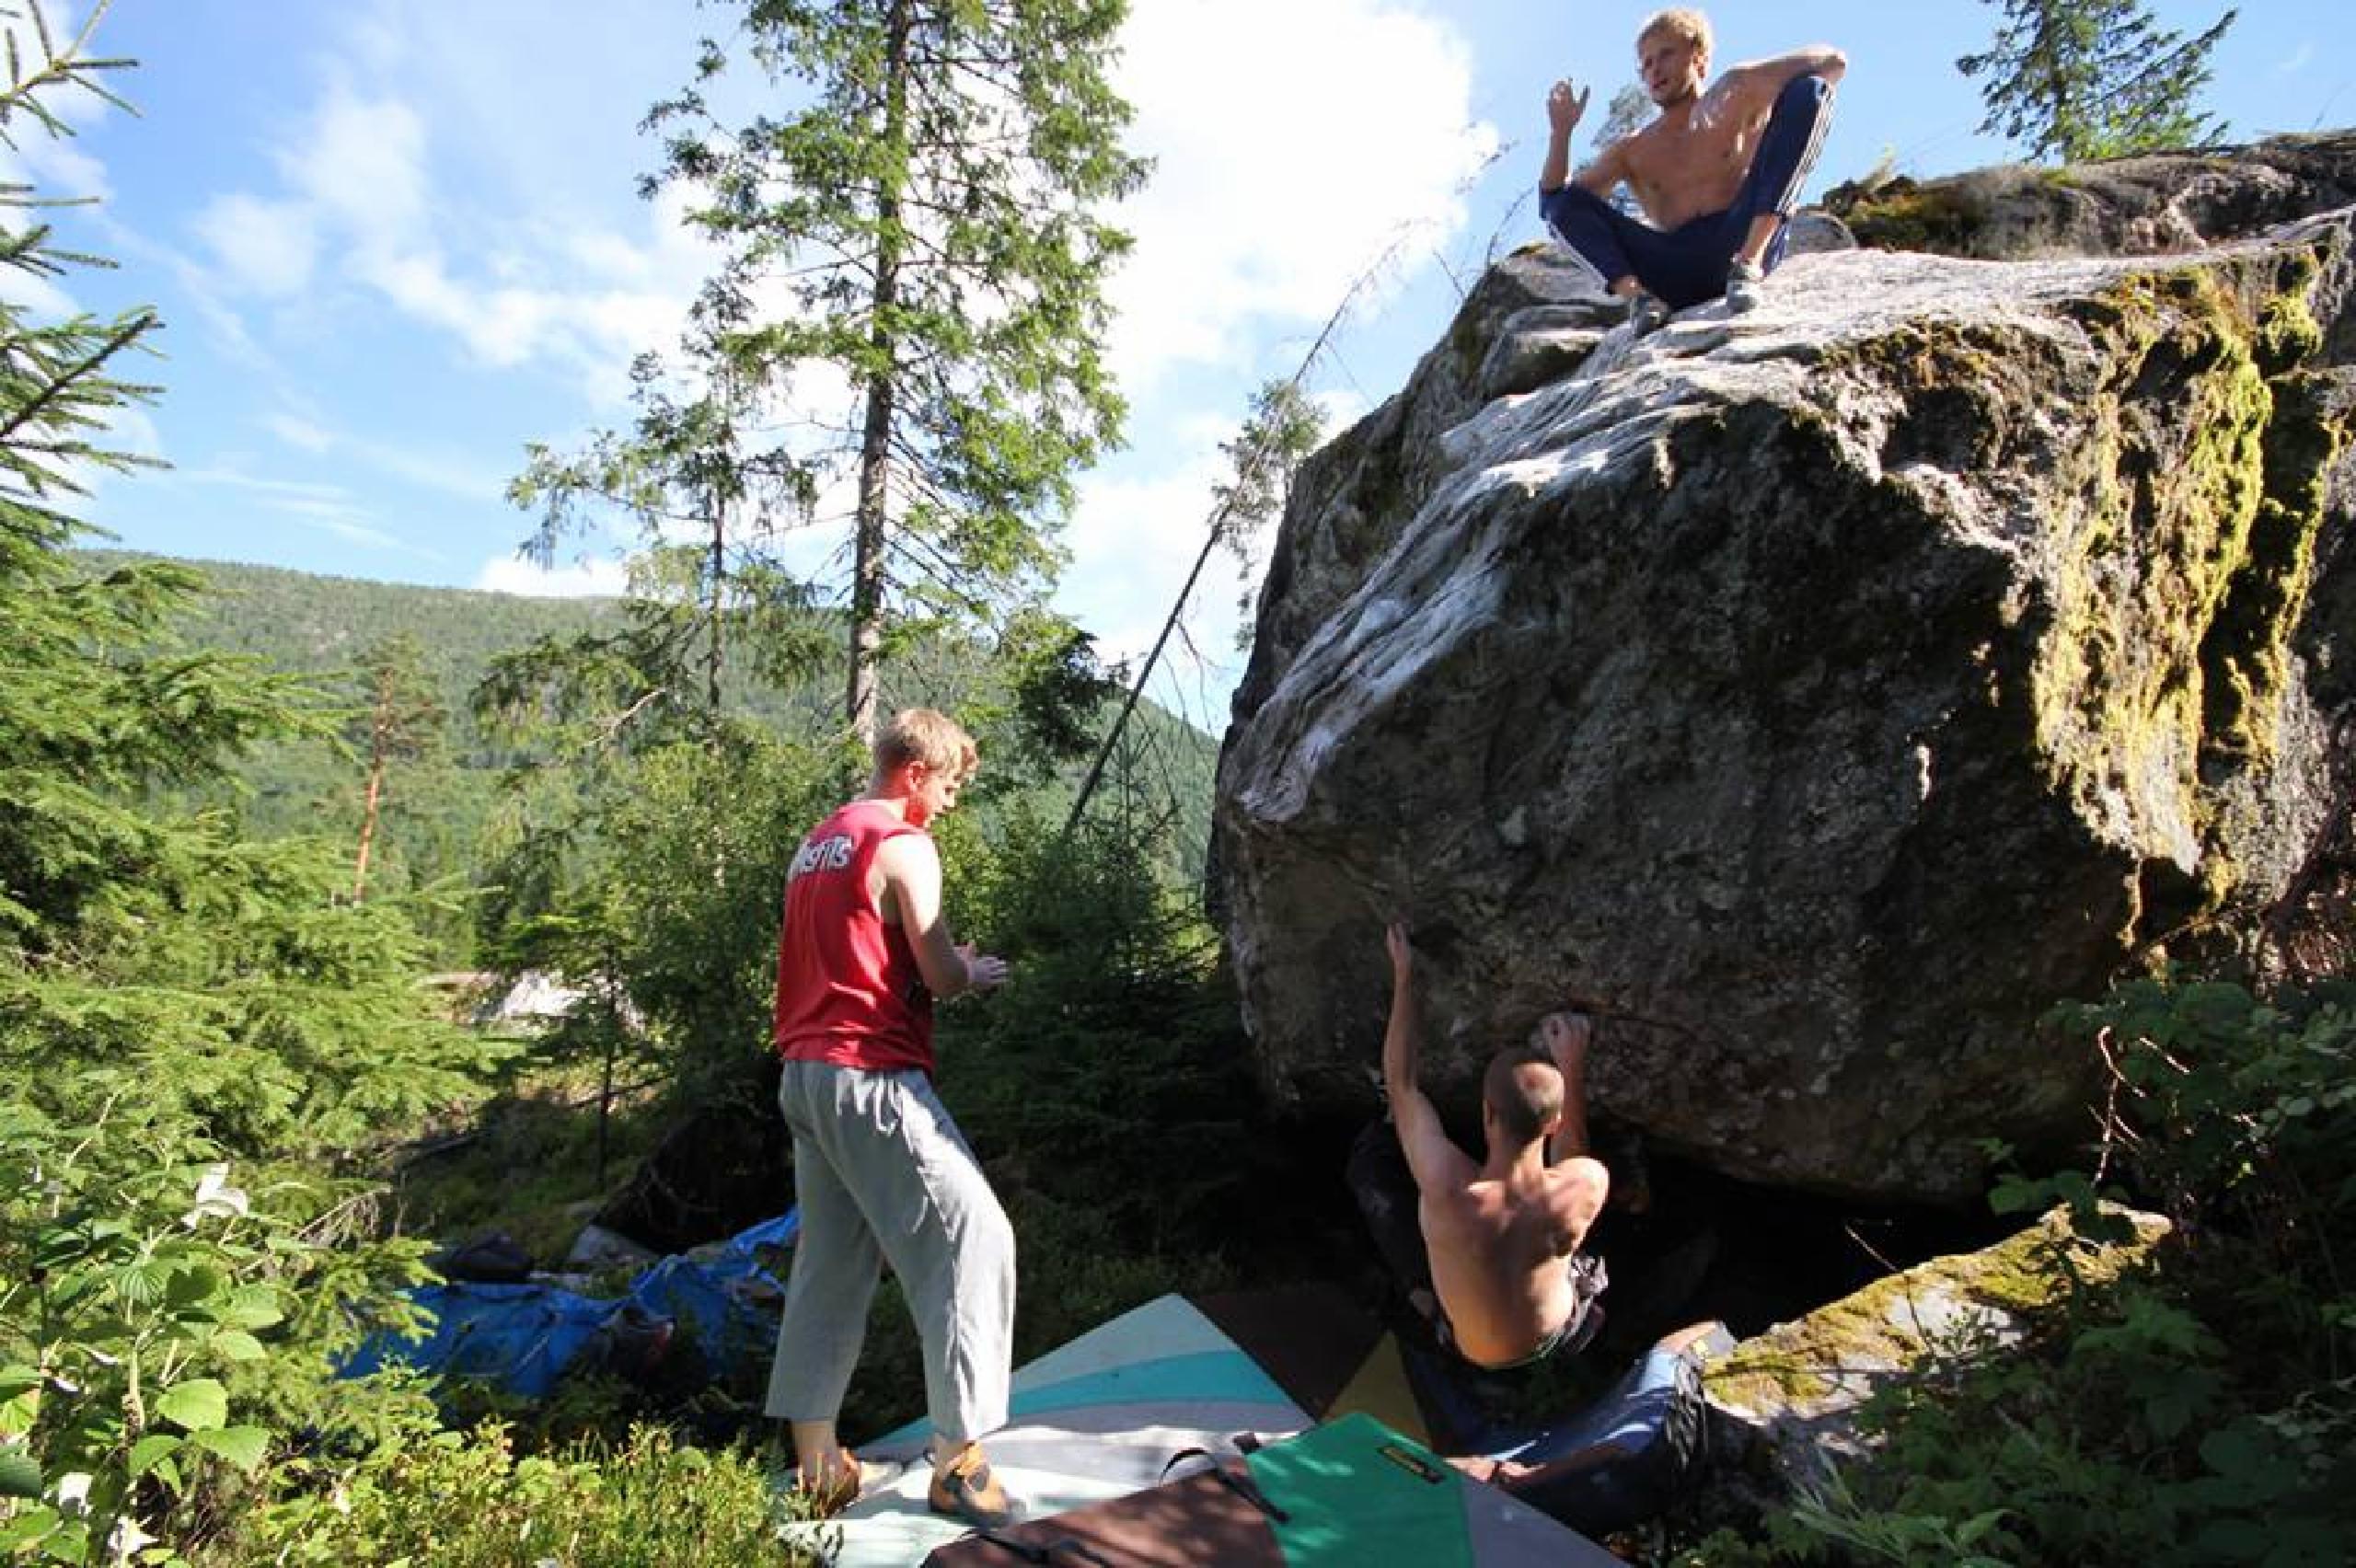 photographer: Lasse Steinmoen, in photo: Jostein Øygarden, Stian Engelsvoll, Tore Årthun